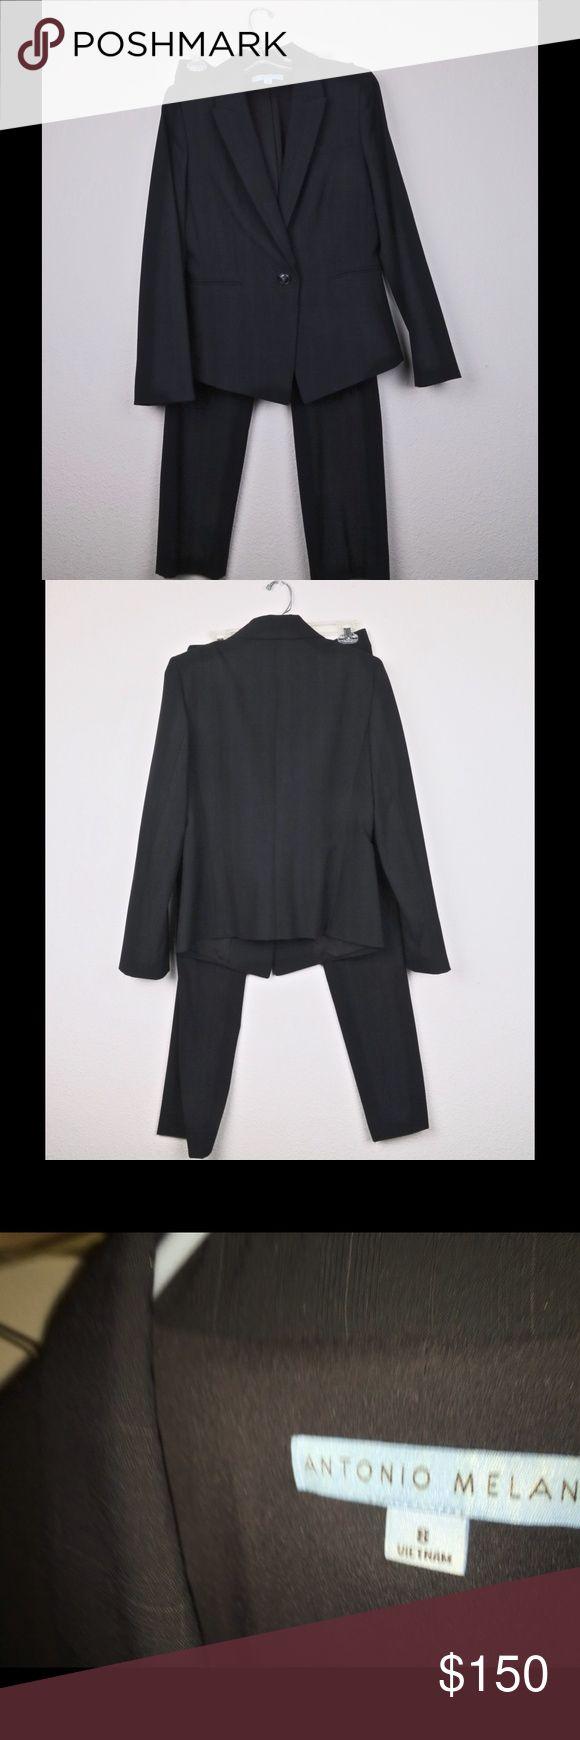 Antonio Melani Timeless Black Suit Size 8 Class follows this classic ANTONIO MELANI pinstripe suit. 8 ANTONIO MELANI Other